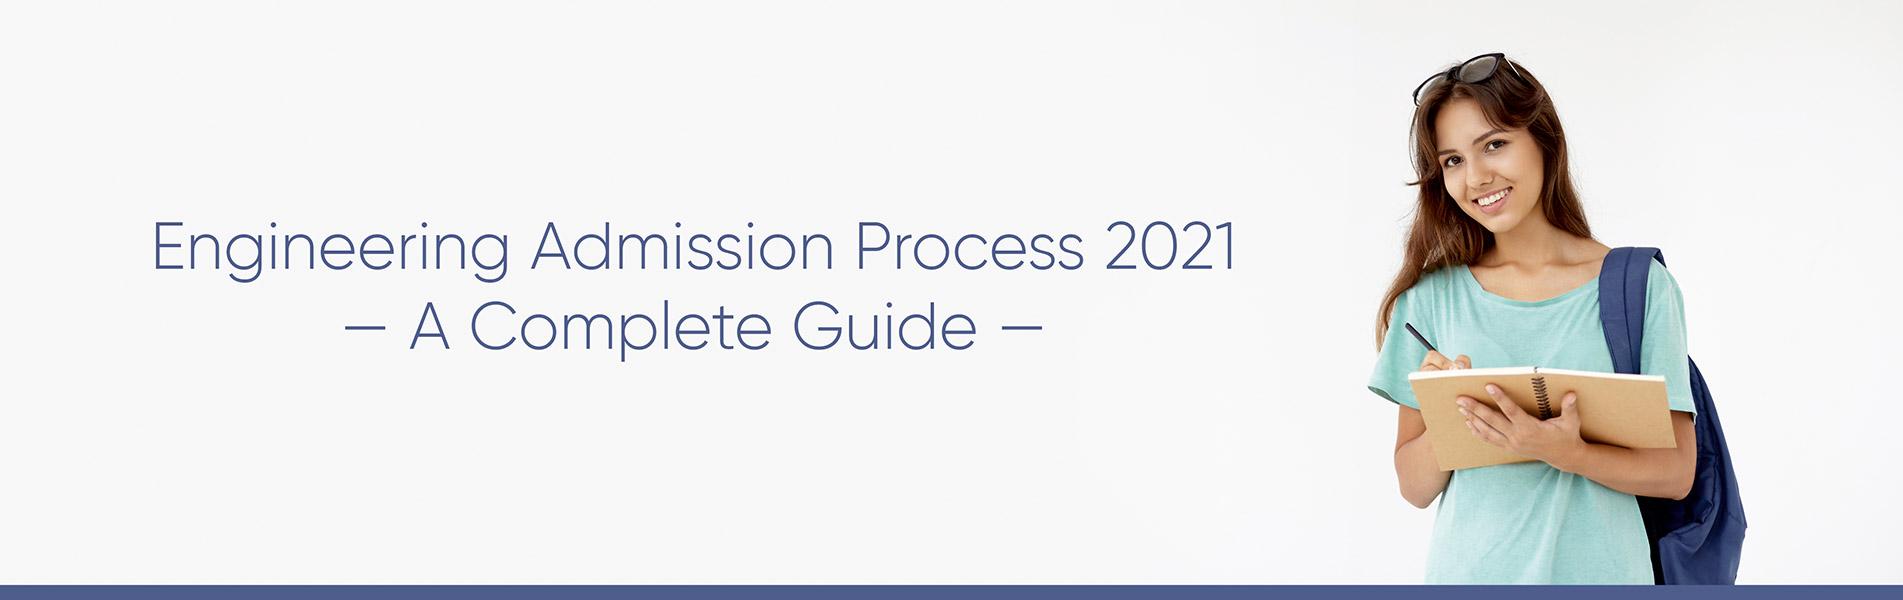 Engineering Admission Process 2021